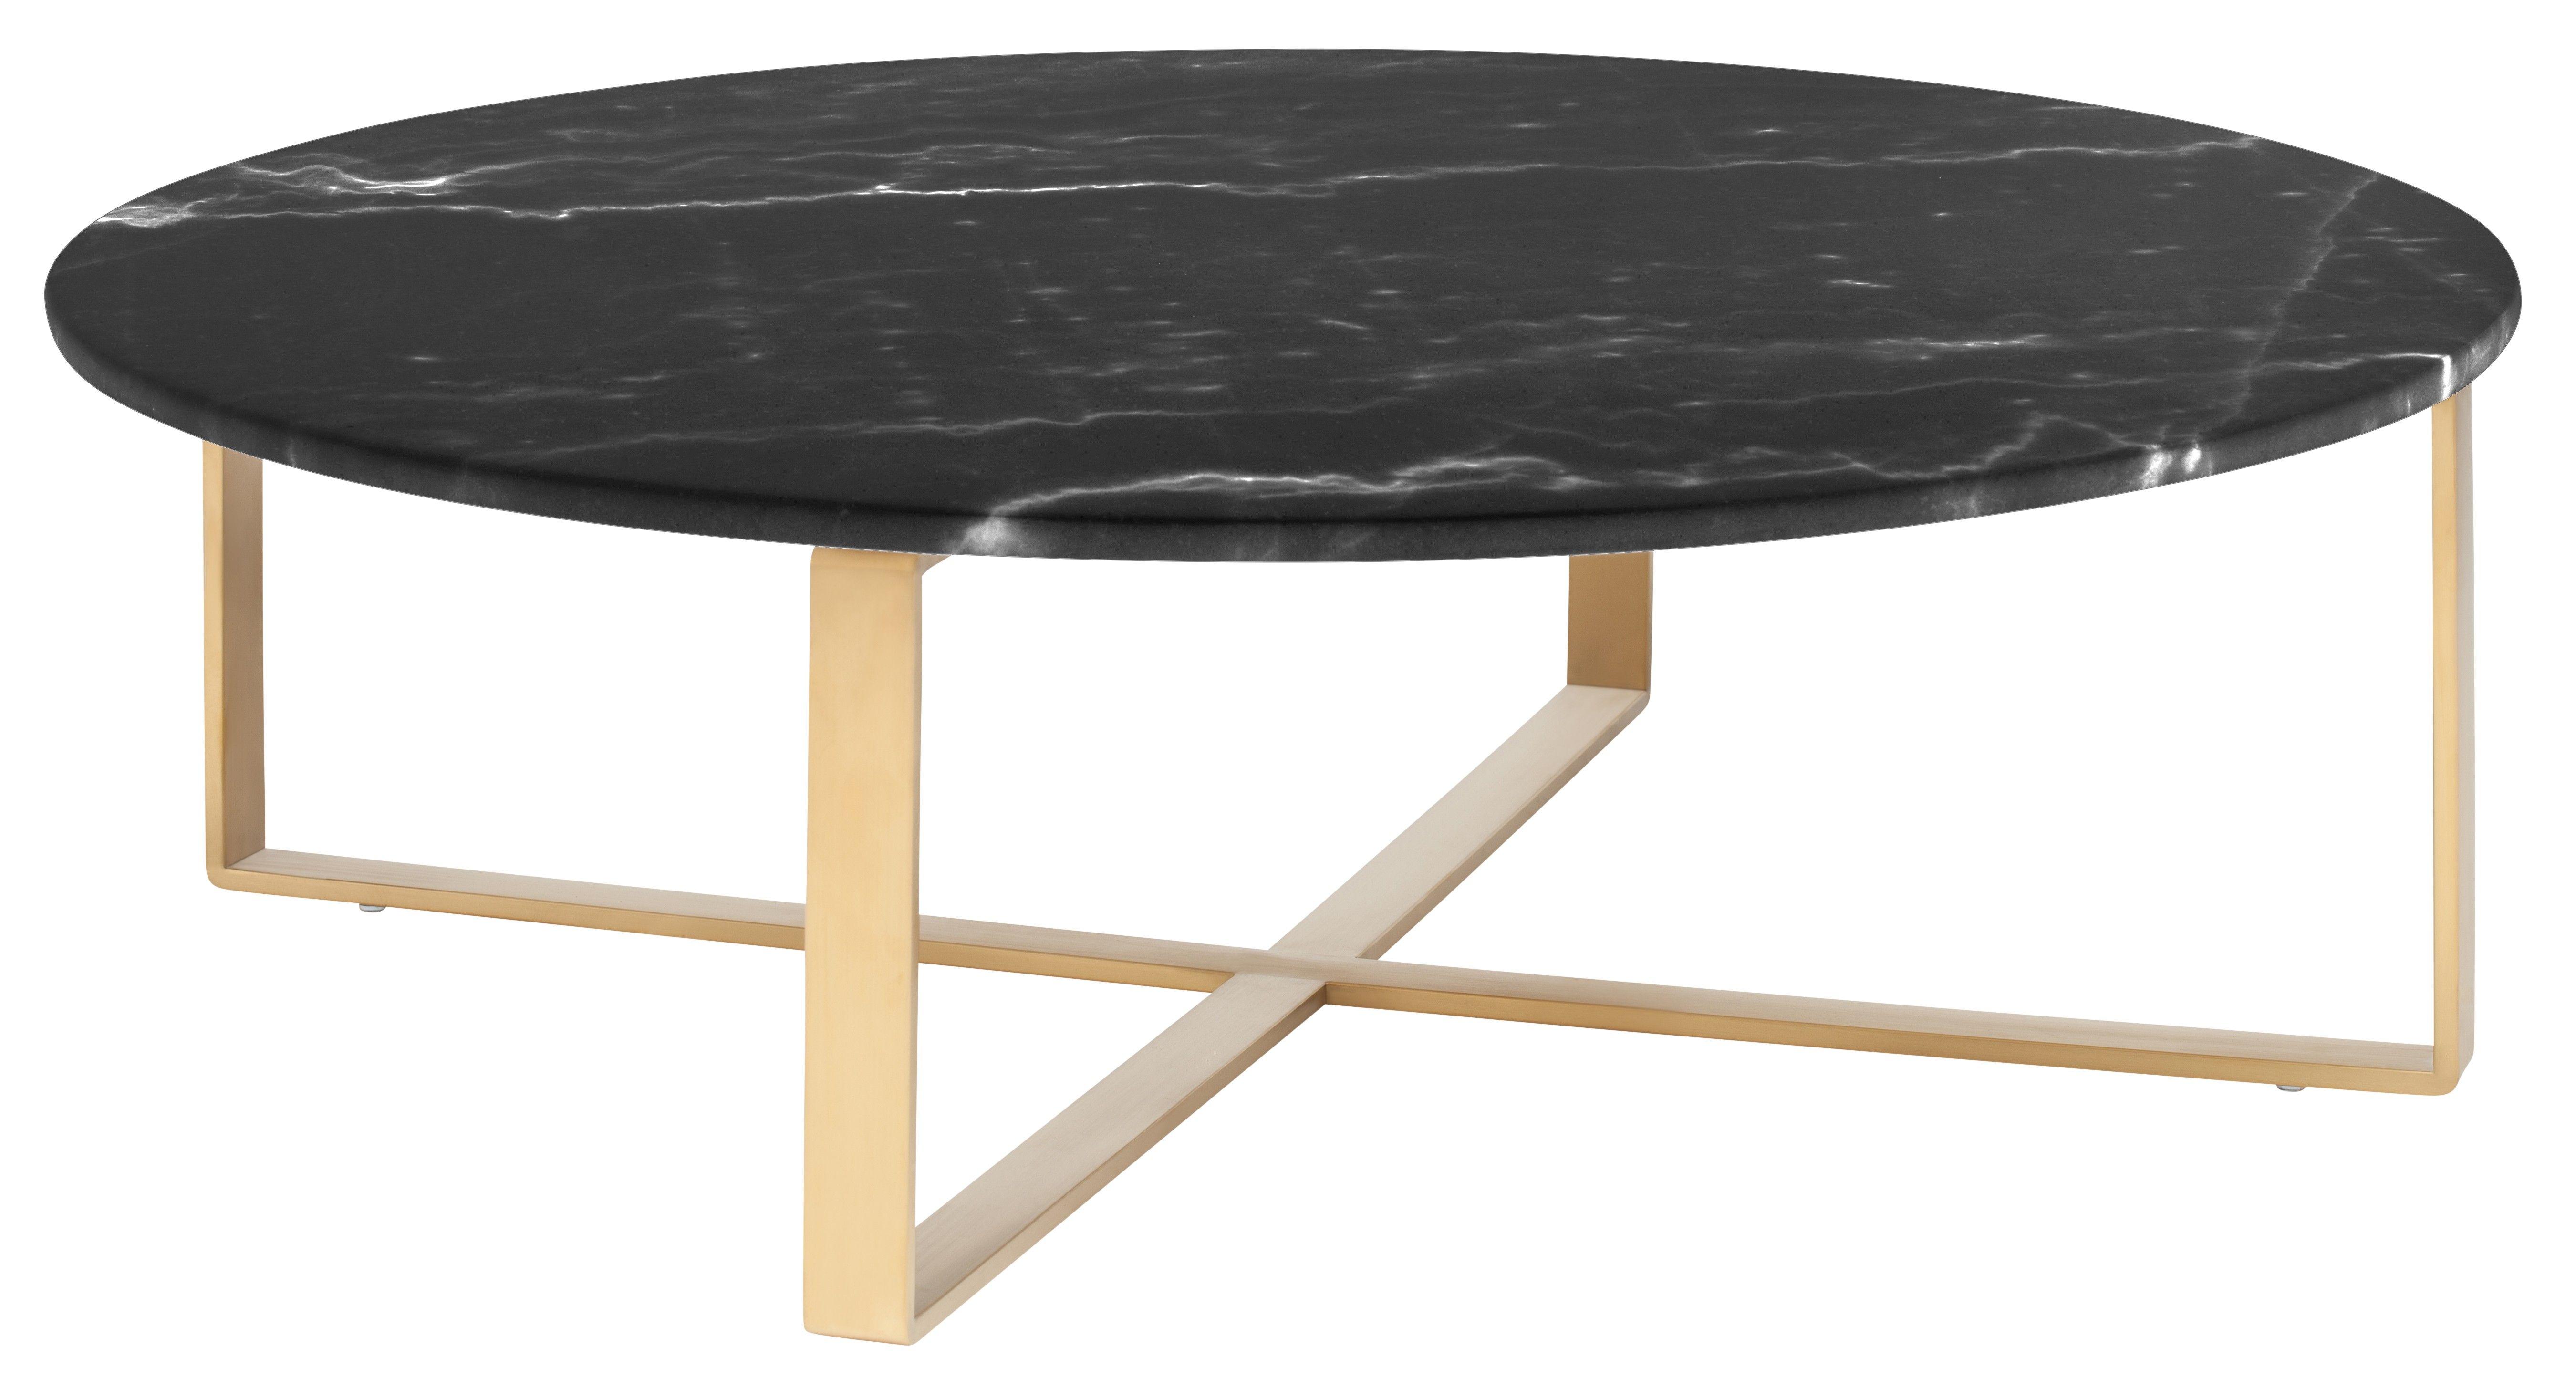 Allie Coffee Table Black Marble Marble Top Coffee Table Marble Coffee Table Gold Coffee Table [ jpg ]